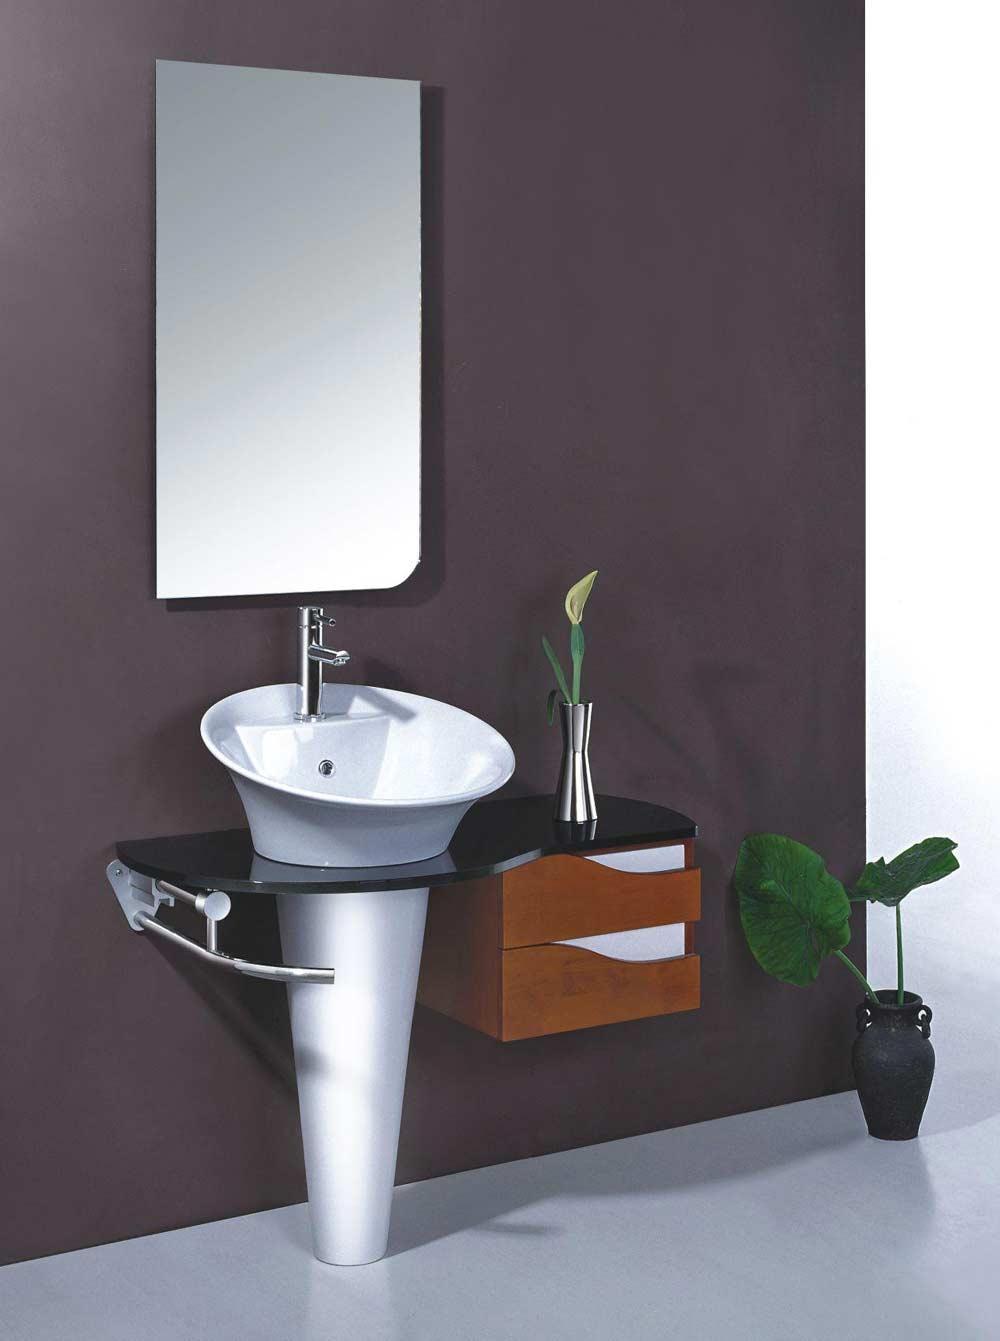 Cone Sink Pedestal Better Home Improvement Www